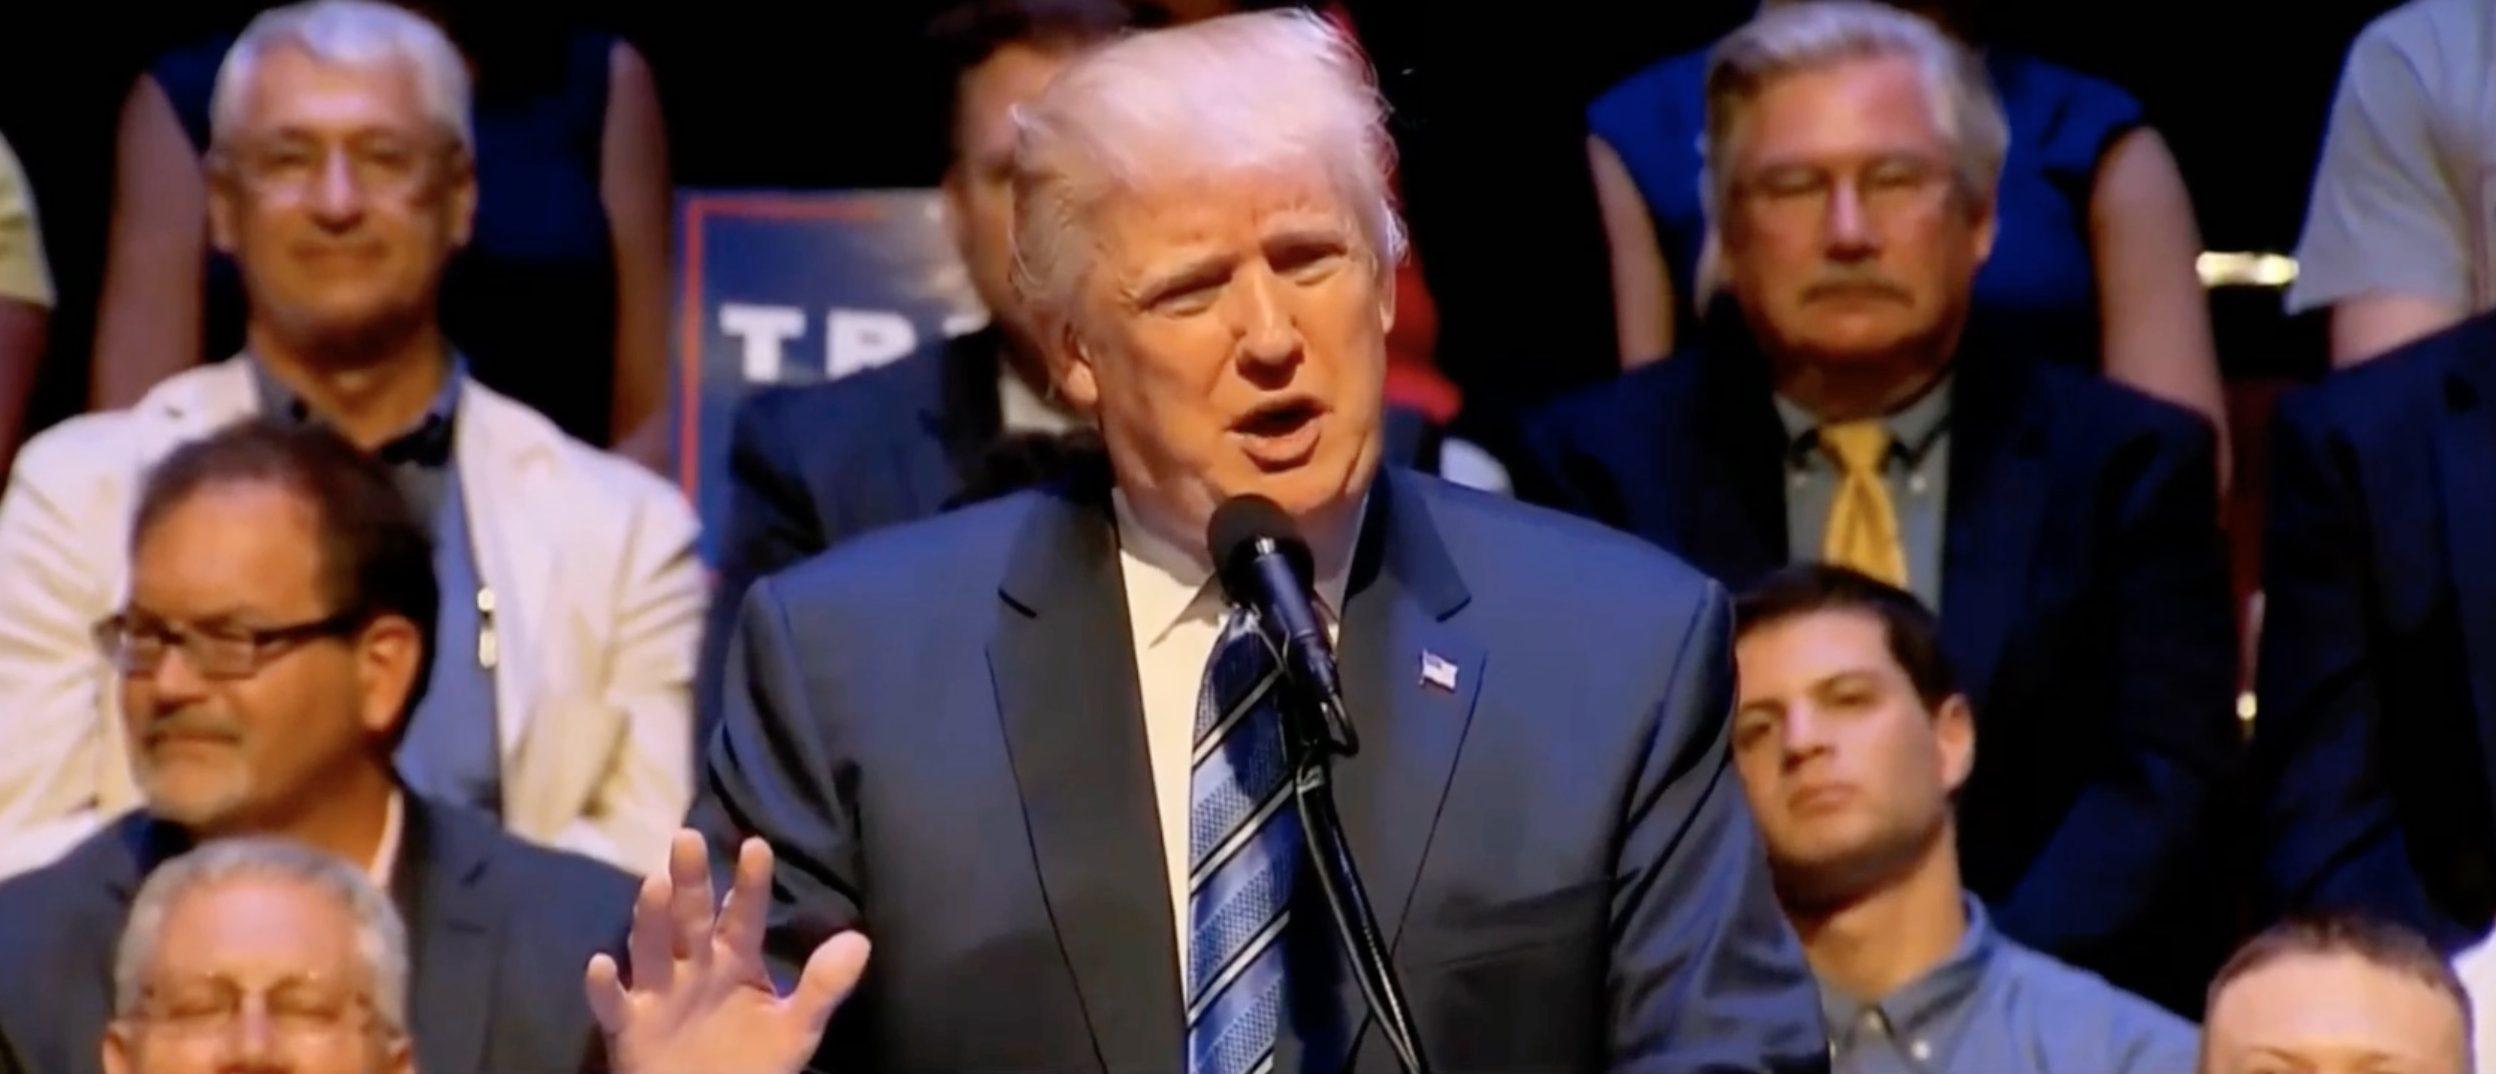 Donald Trump, Screen Grab RSBN YouTube, 8-4-2016